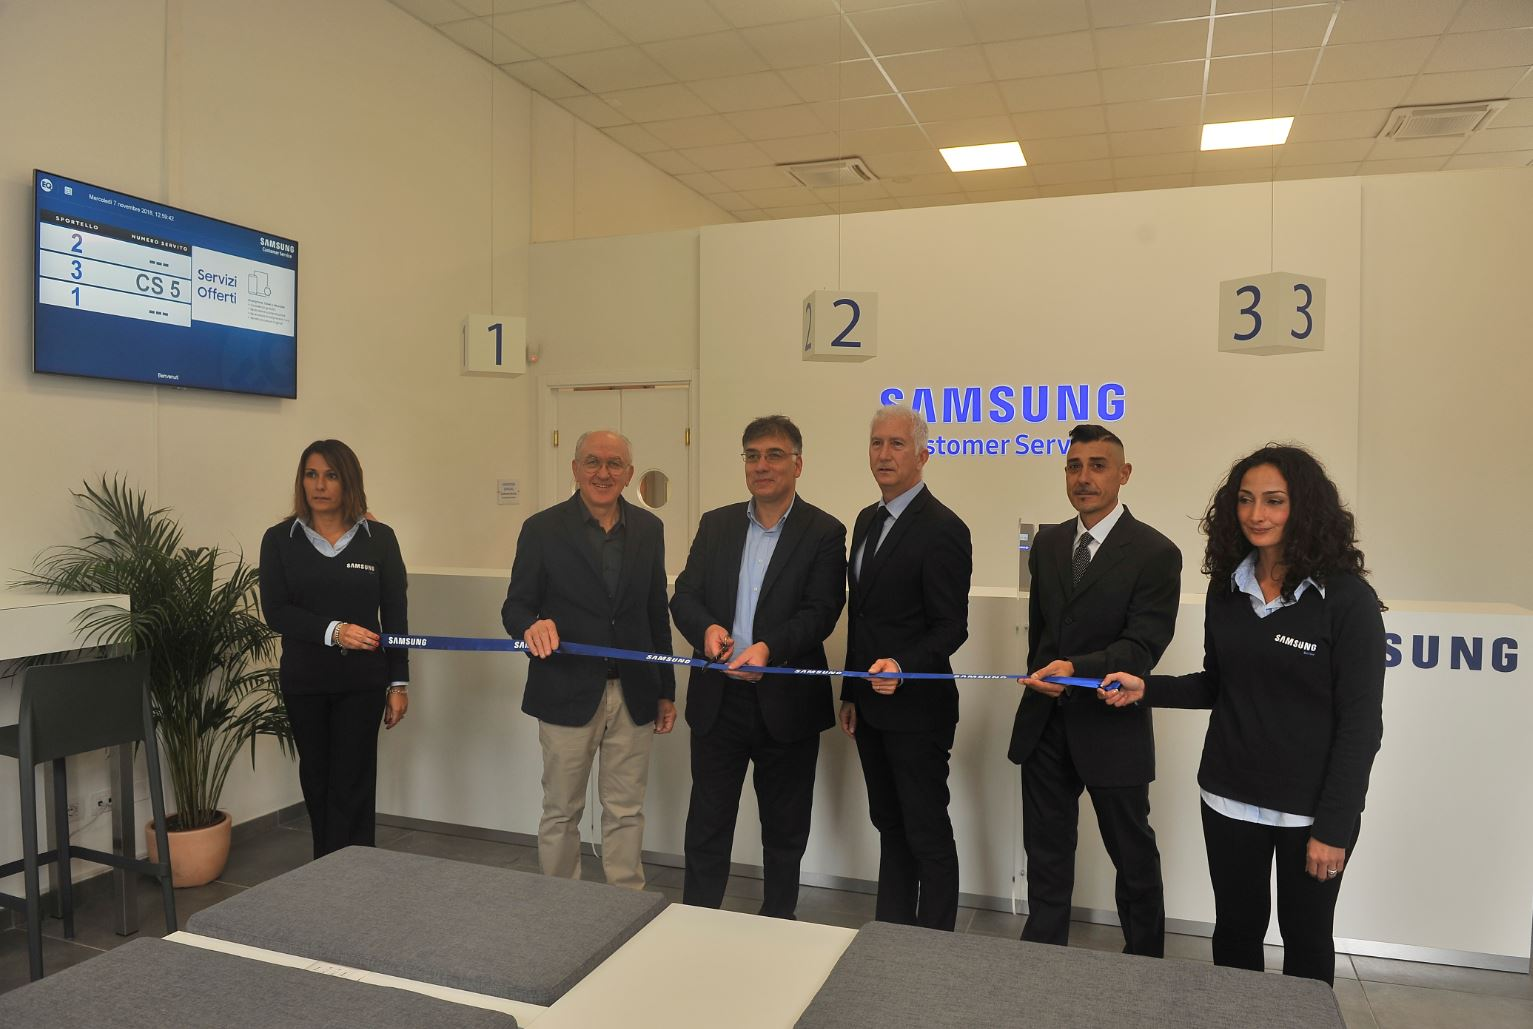 Centro Assistenza Samsung Pisa.Apre A Pisa Il Samsung Customer Service Samsung Newsroom